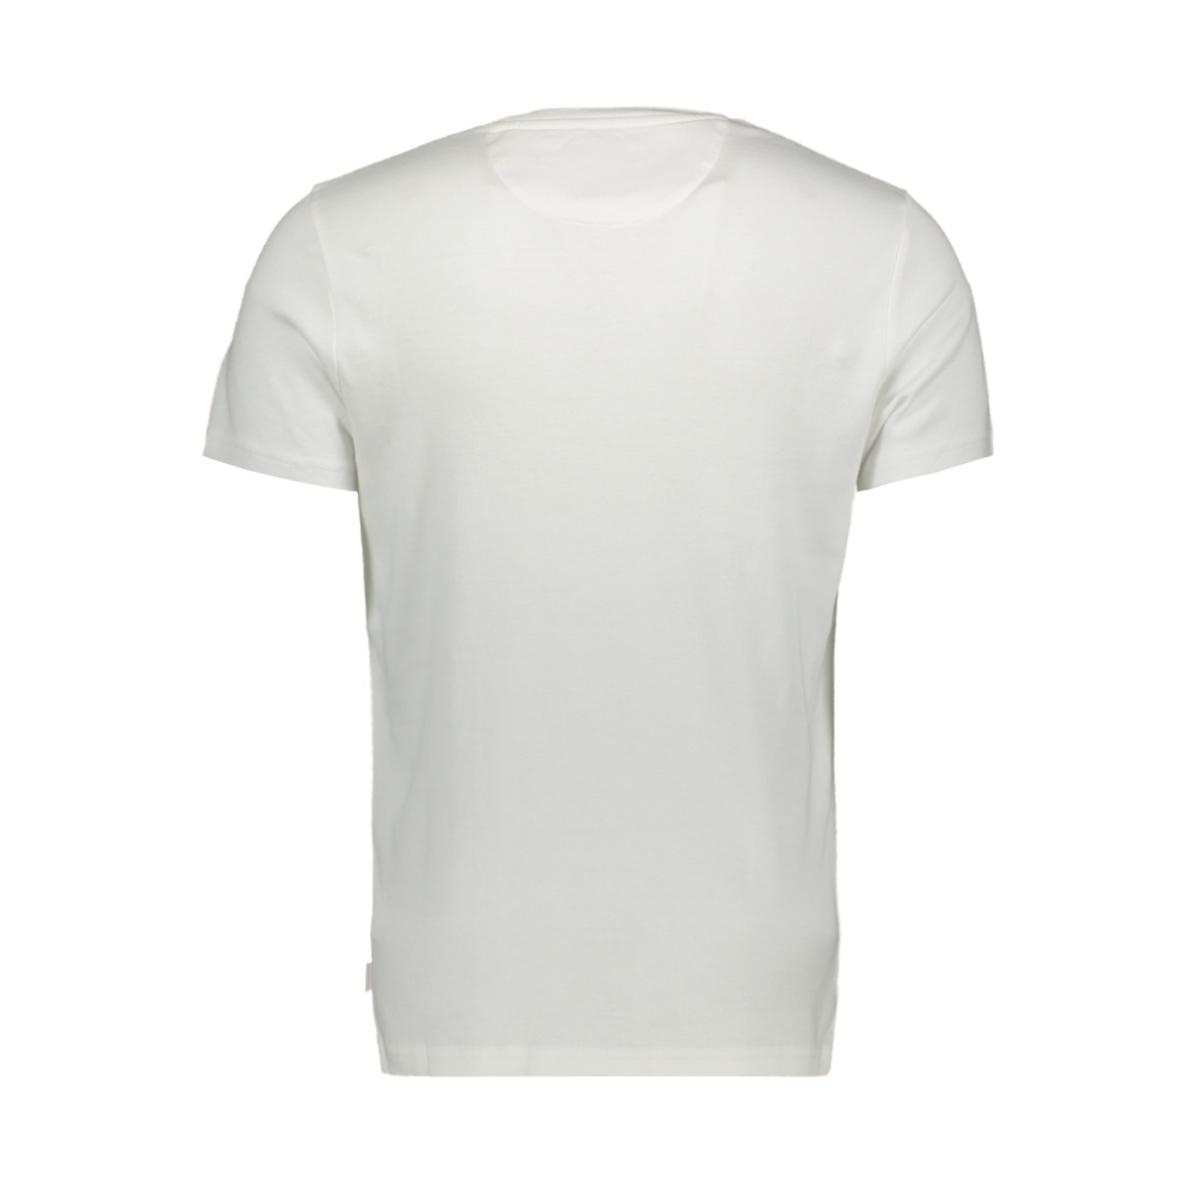 edit jersey tee m1000044a superdry t-shirt optic